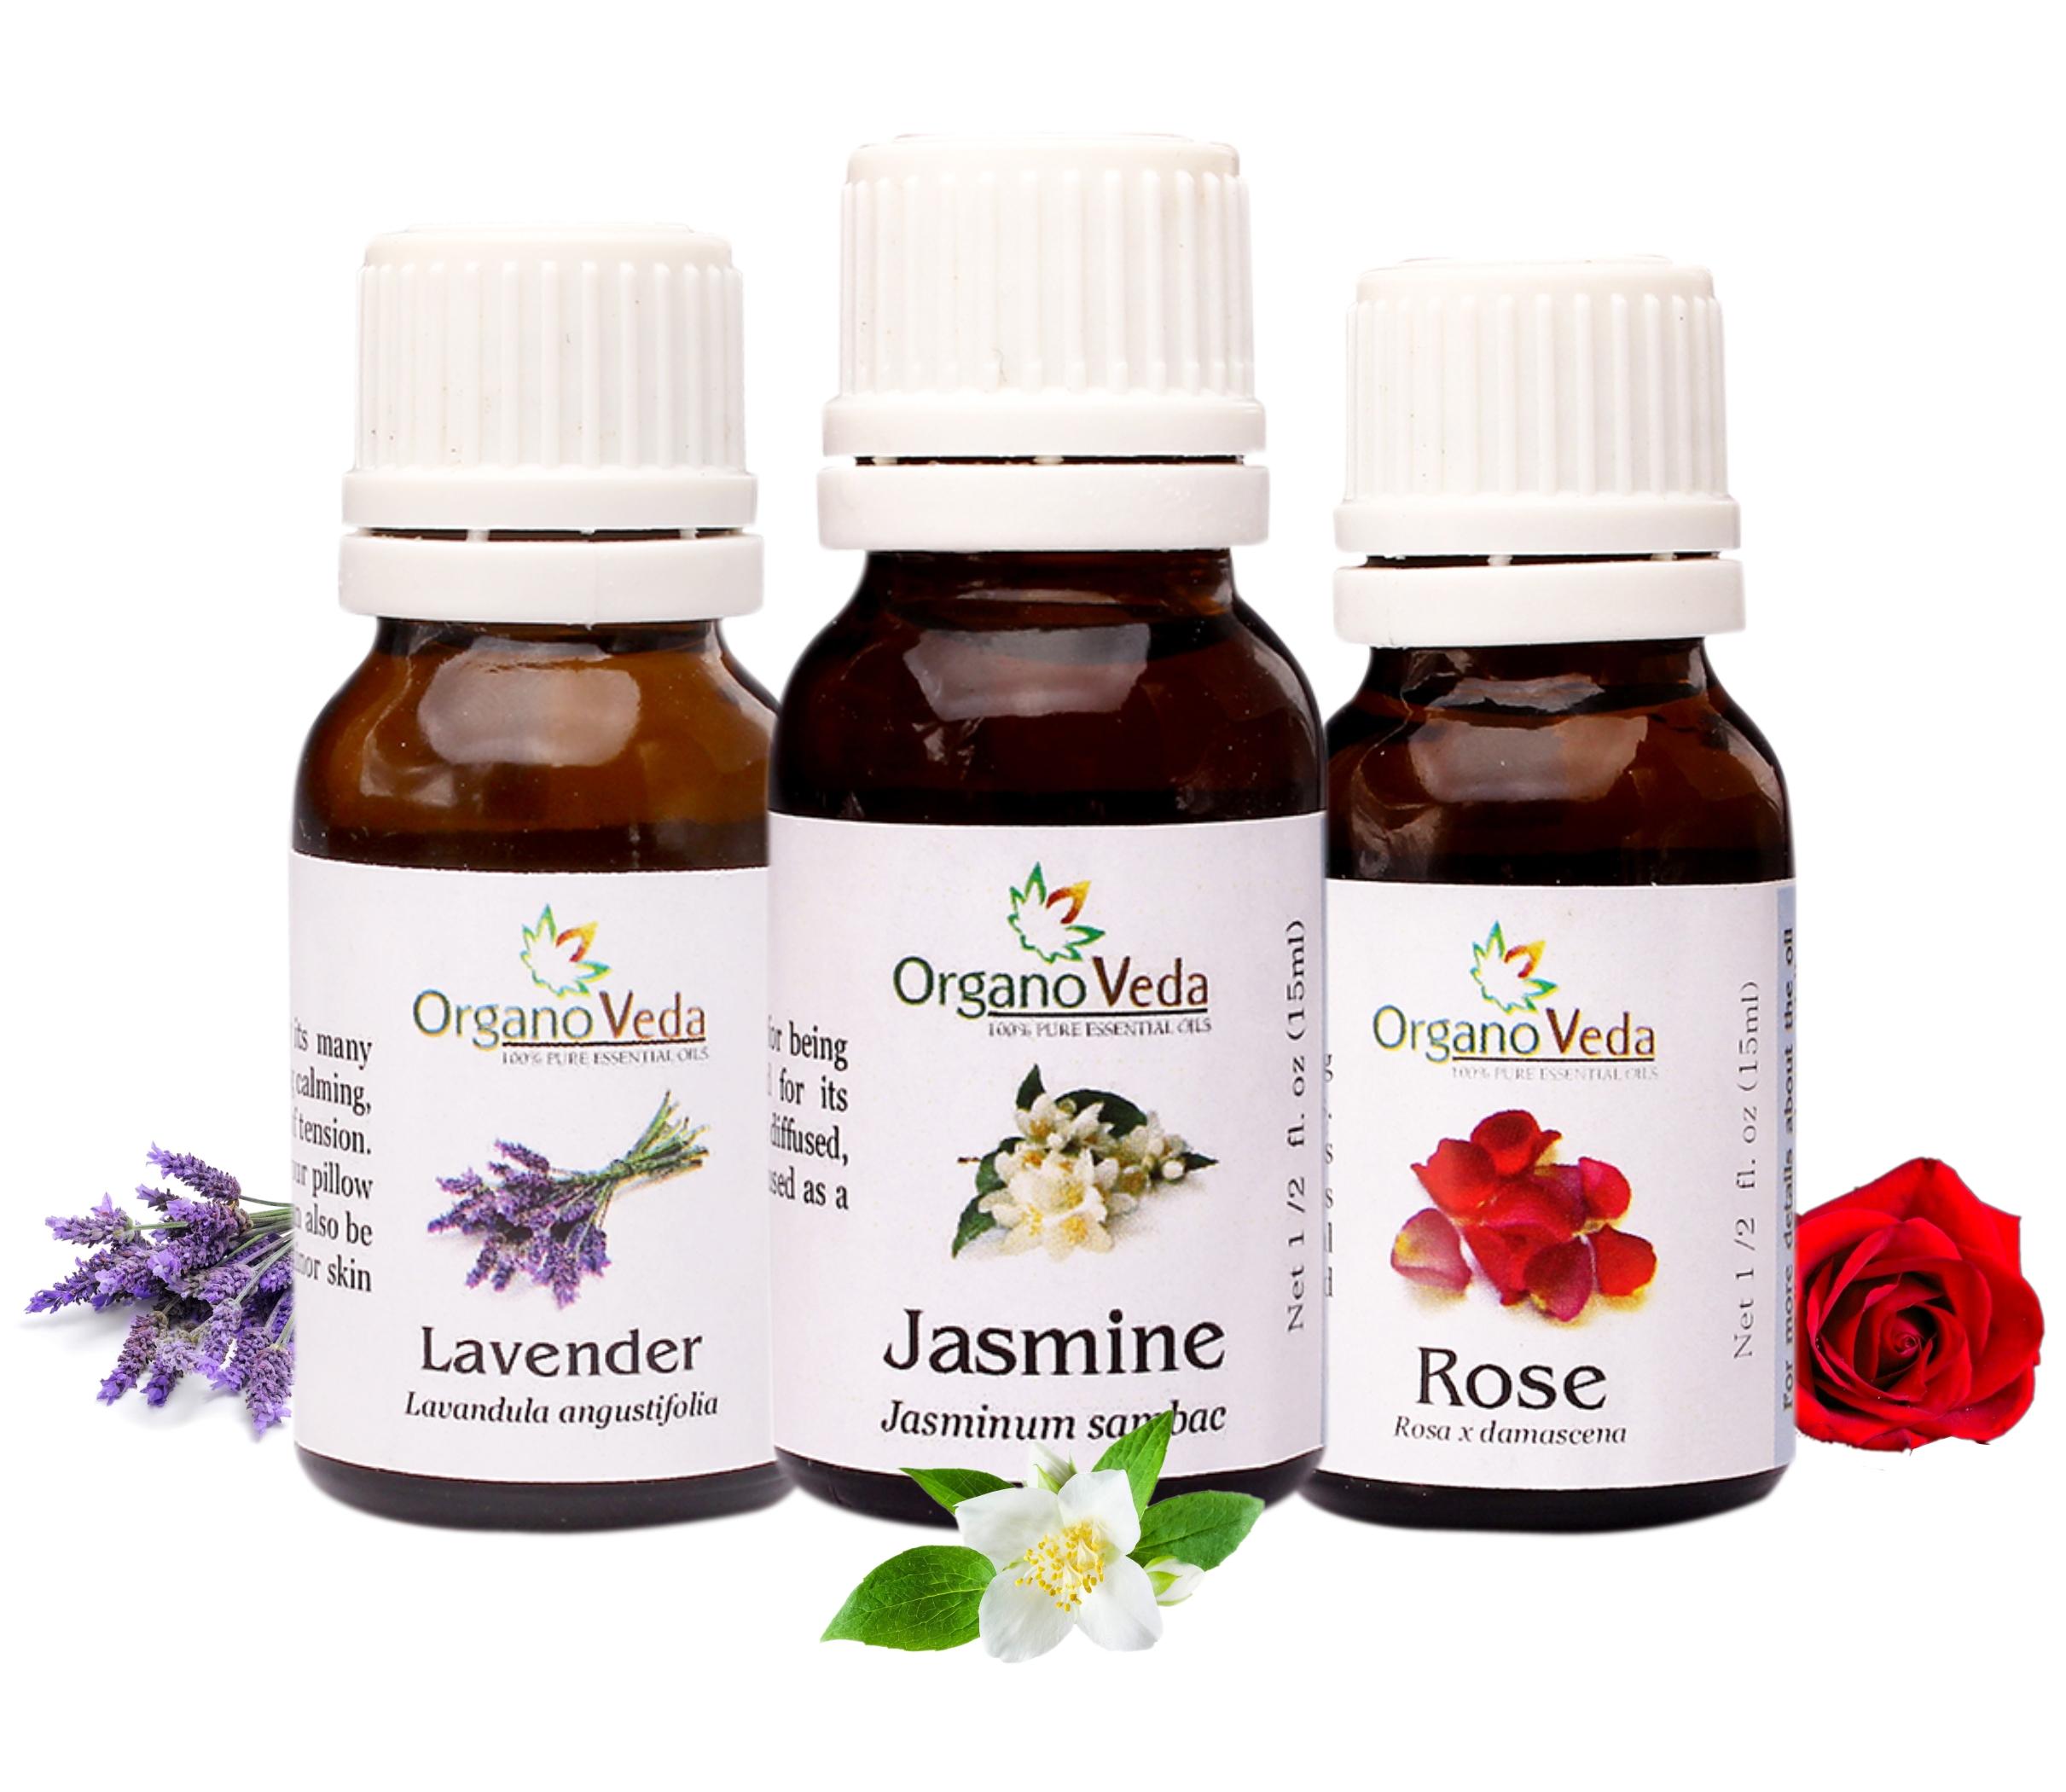 Heavy exotic florals lavender jasmine rose essential oils combo on sale izmirmasajfo